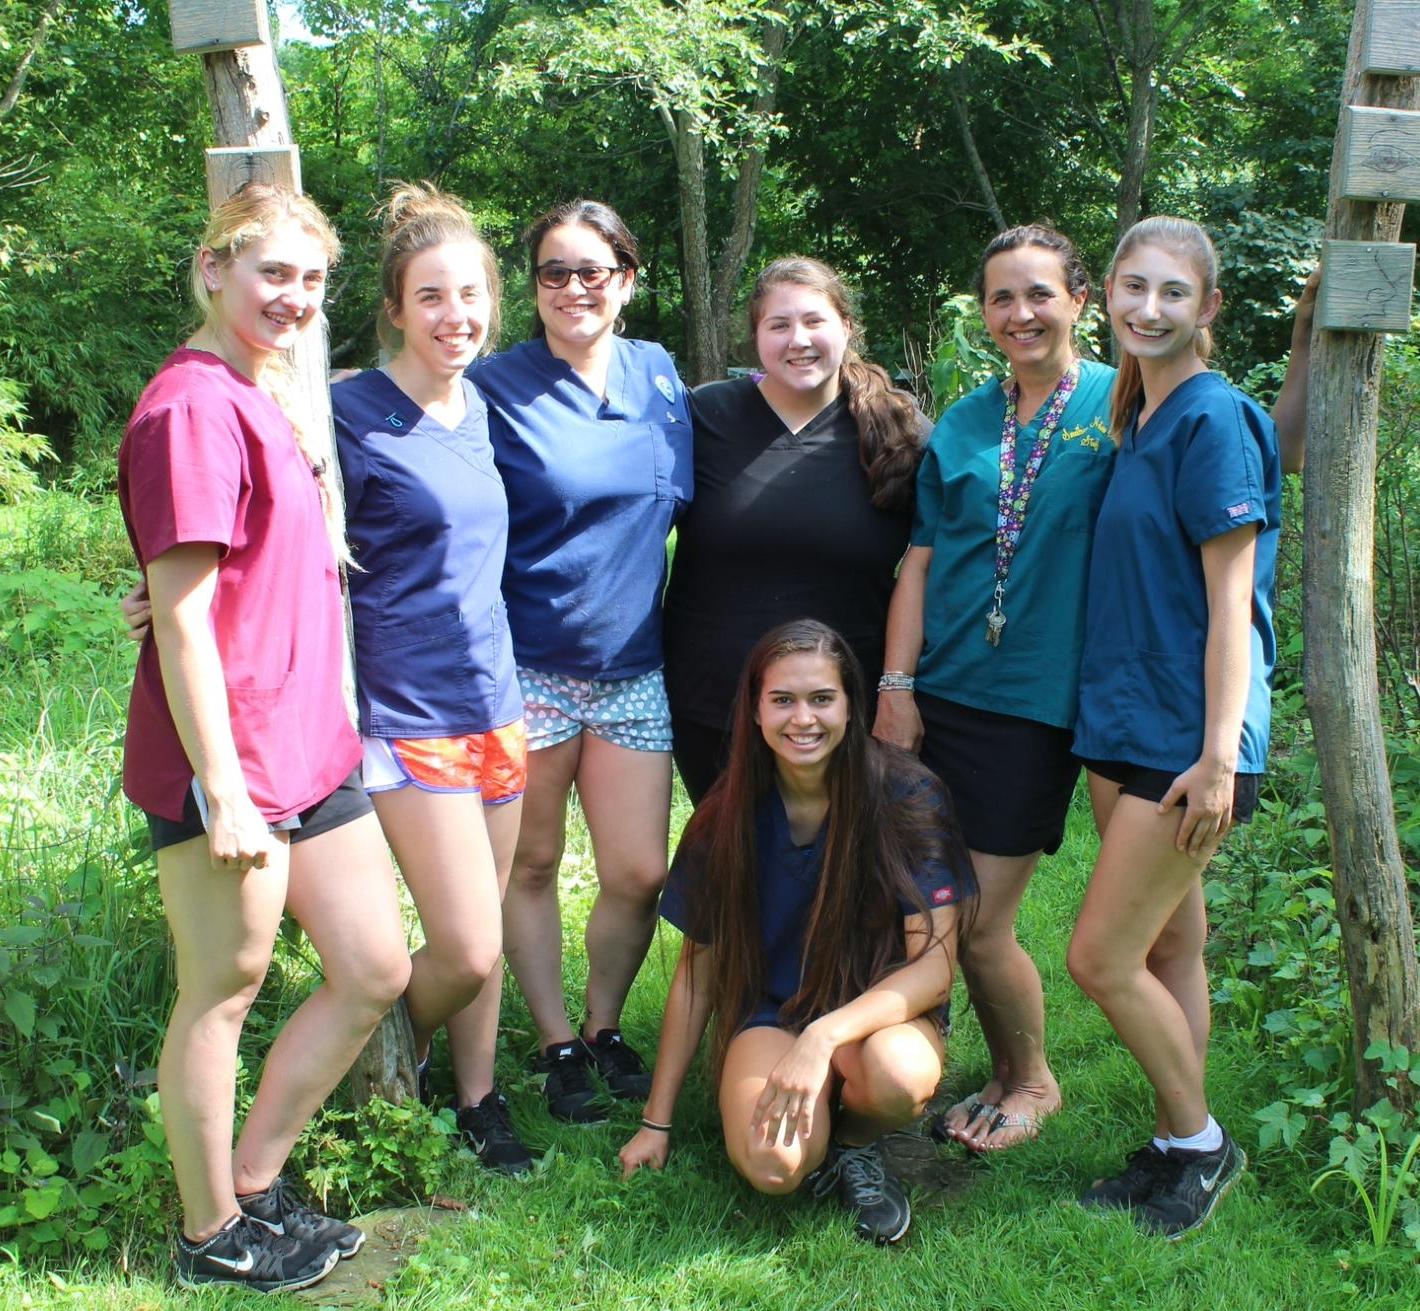 Summer interns for wildlife rehabilitation 2018